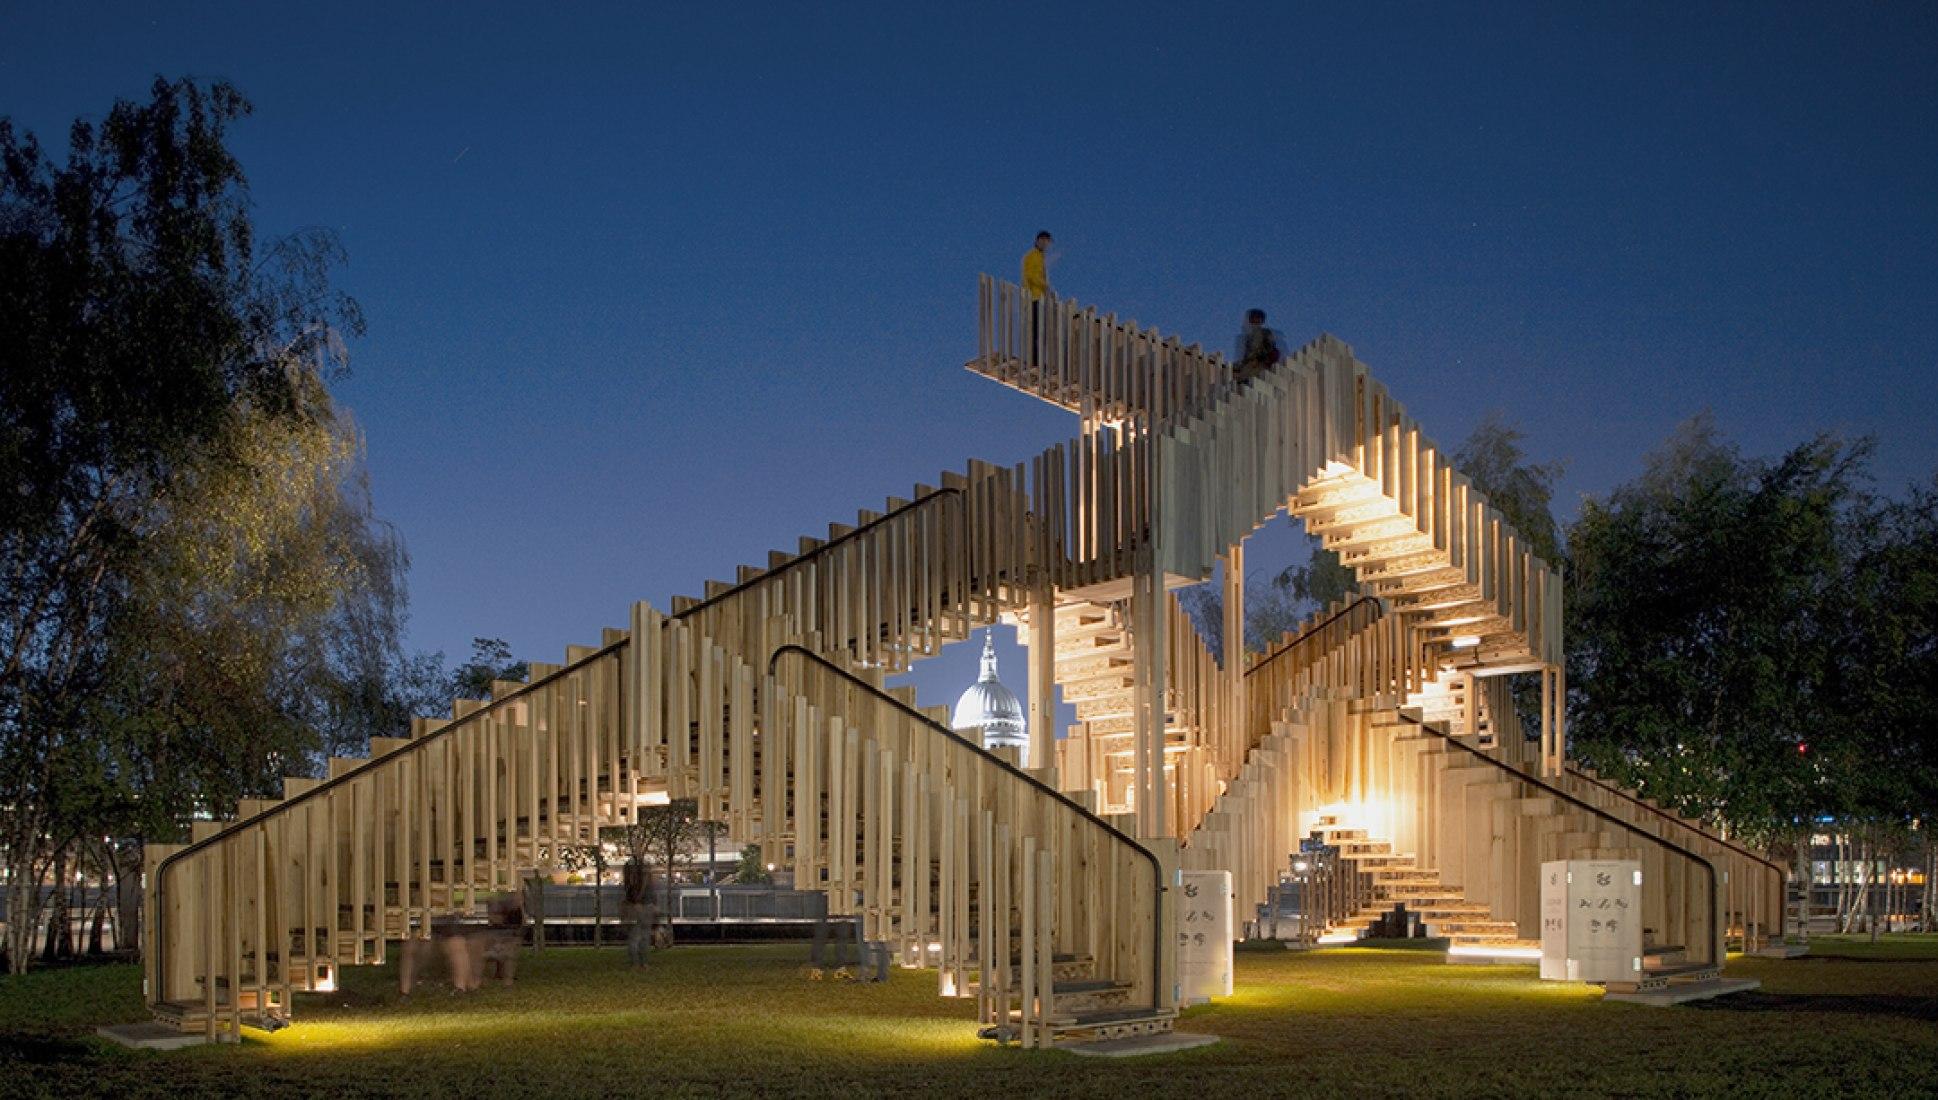 Vista nocturna. Endless Stair por Rijke Marsh Morgan Architects (dRMM), Londres. Fotografía © Alex de Rijke.